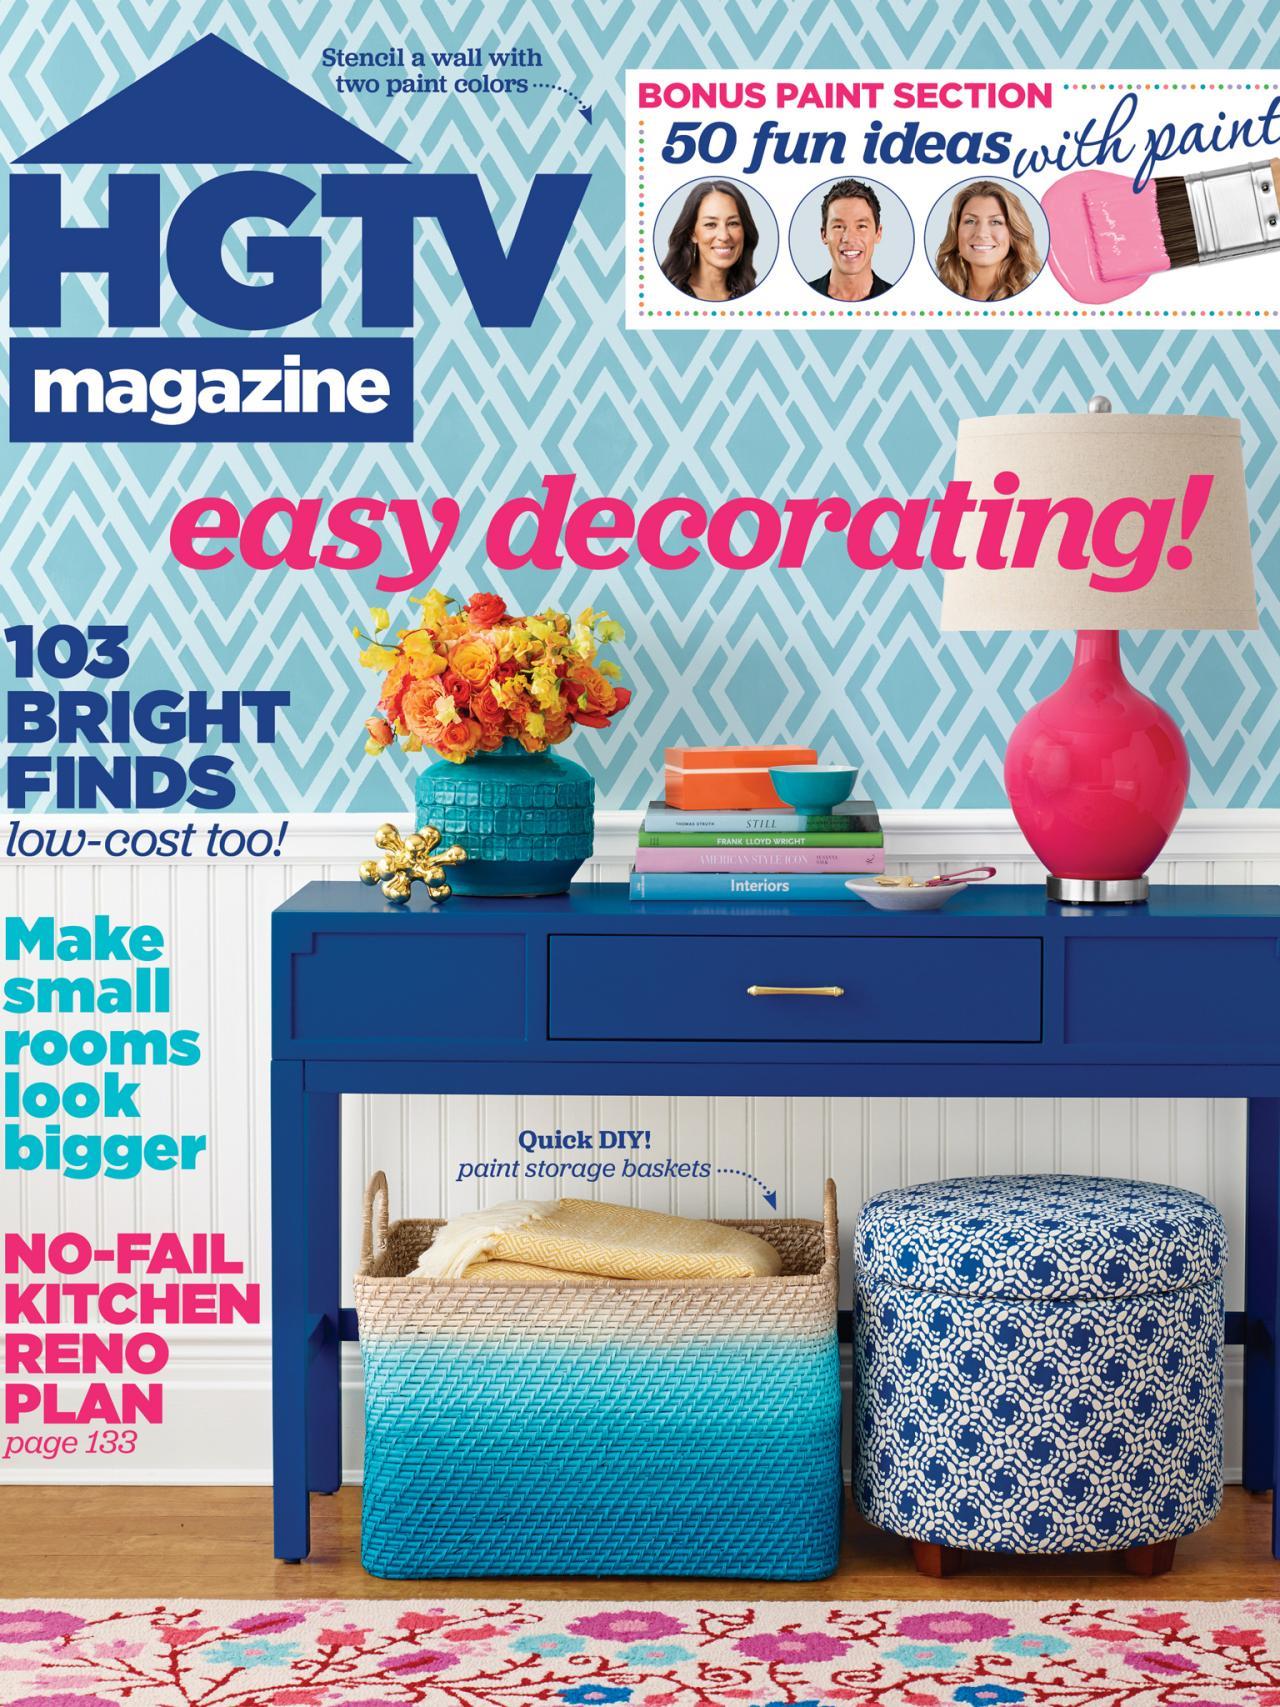 HGTV Magazine: May 2015 | HGTV